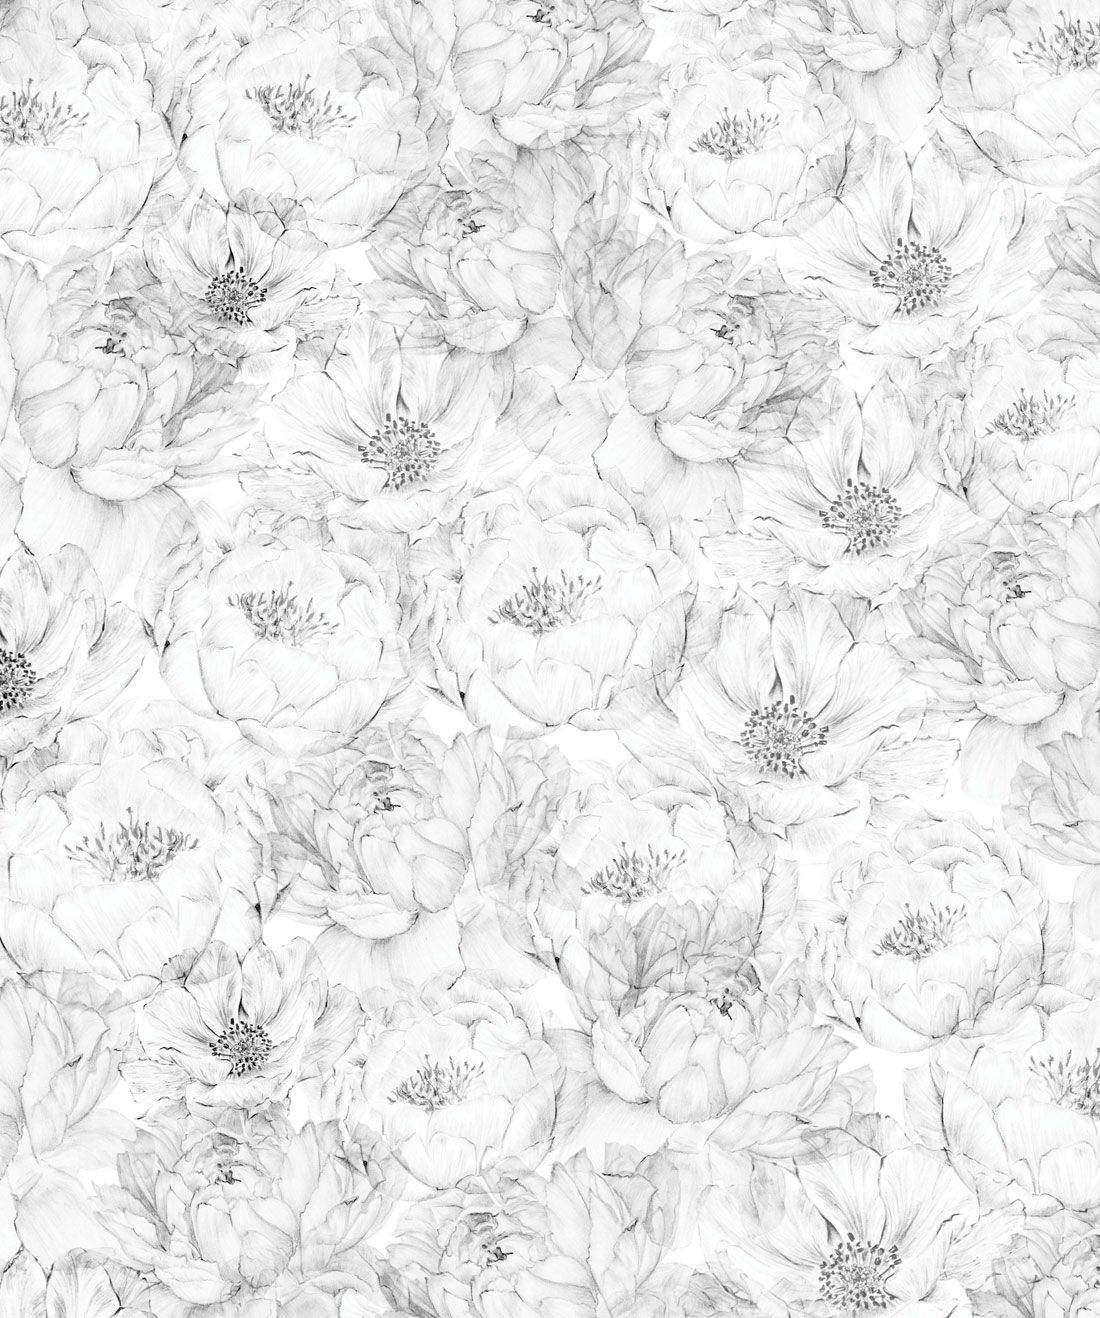 Peonies & Anemones Wallpaper (Two Roll Set)